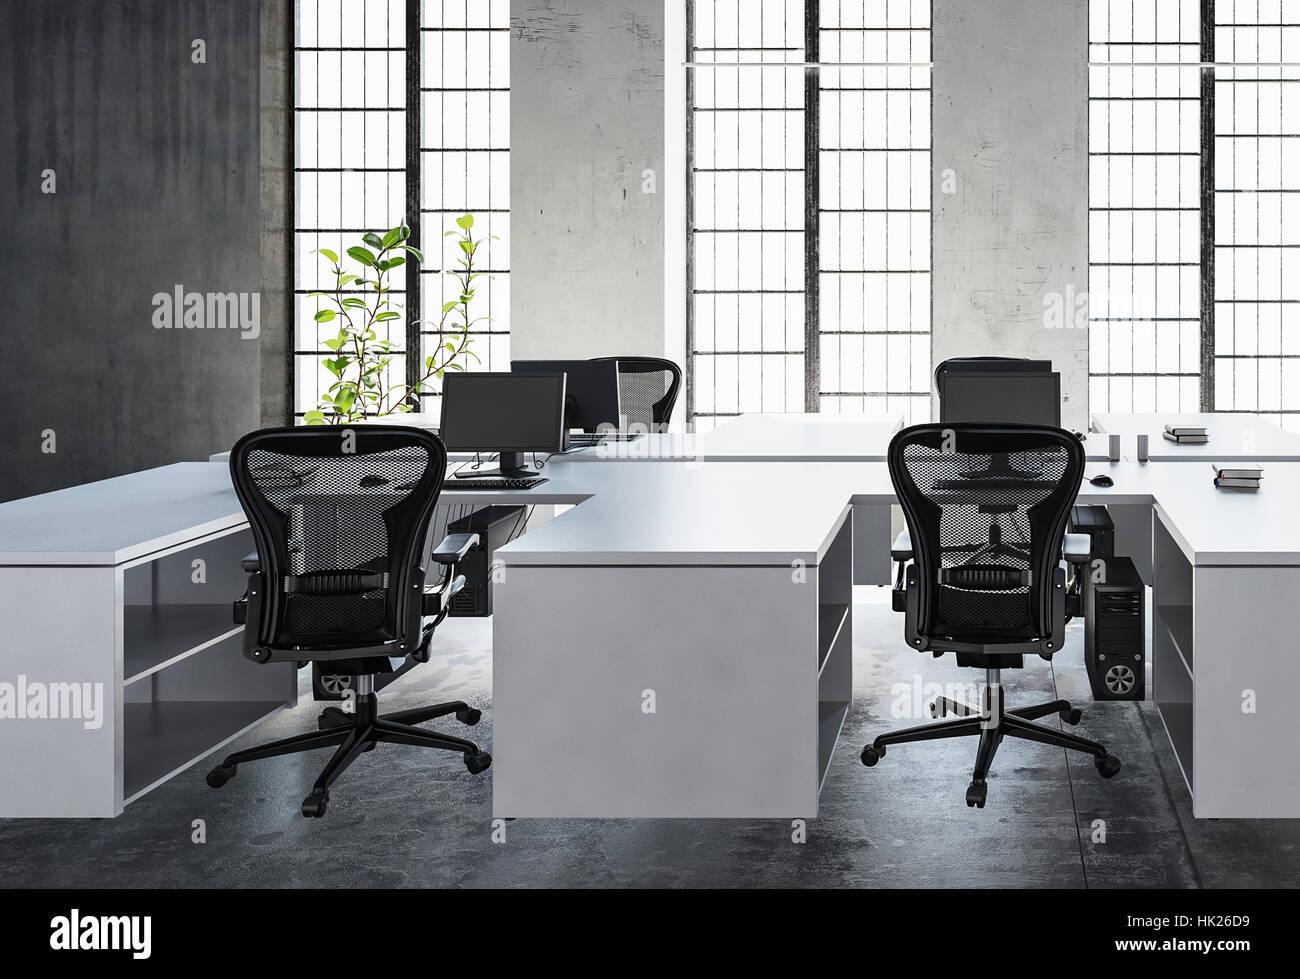 Espace de bureau moderne avec un bureau blanc vide murs de béton